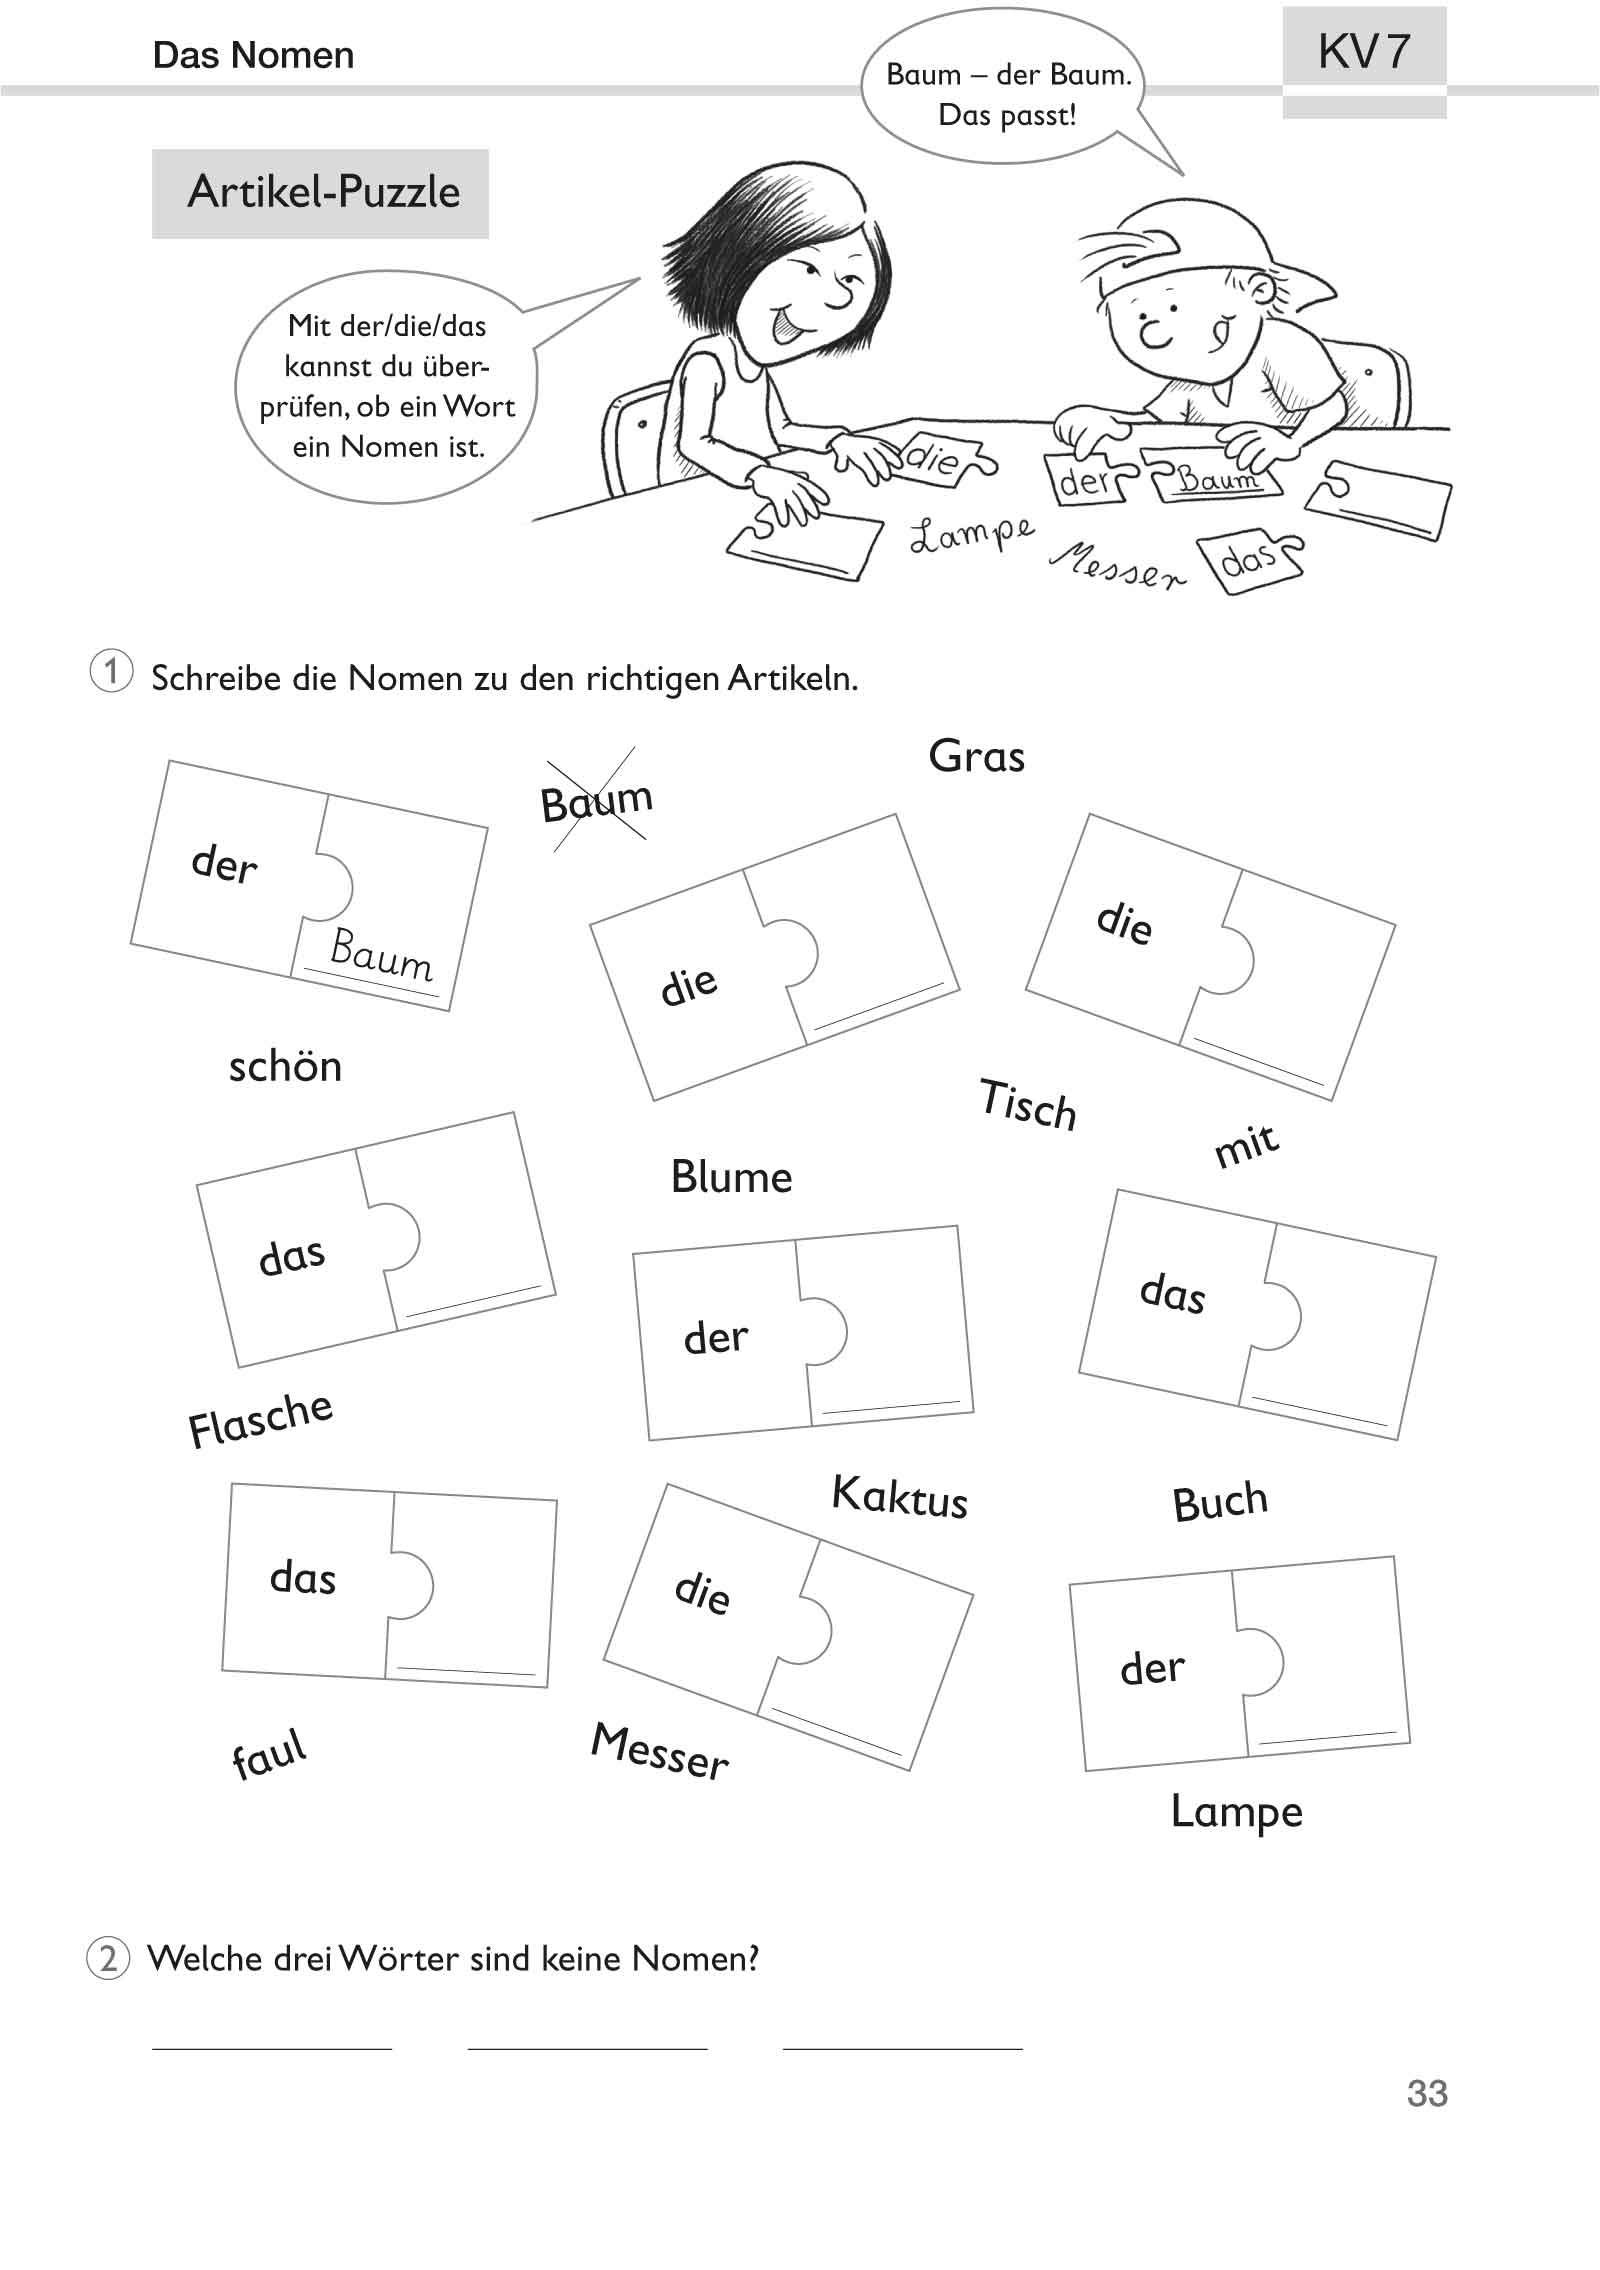 Grammatik Kompetent 1 2 Schubi